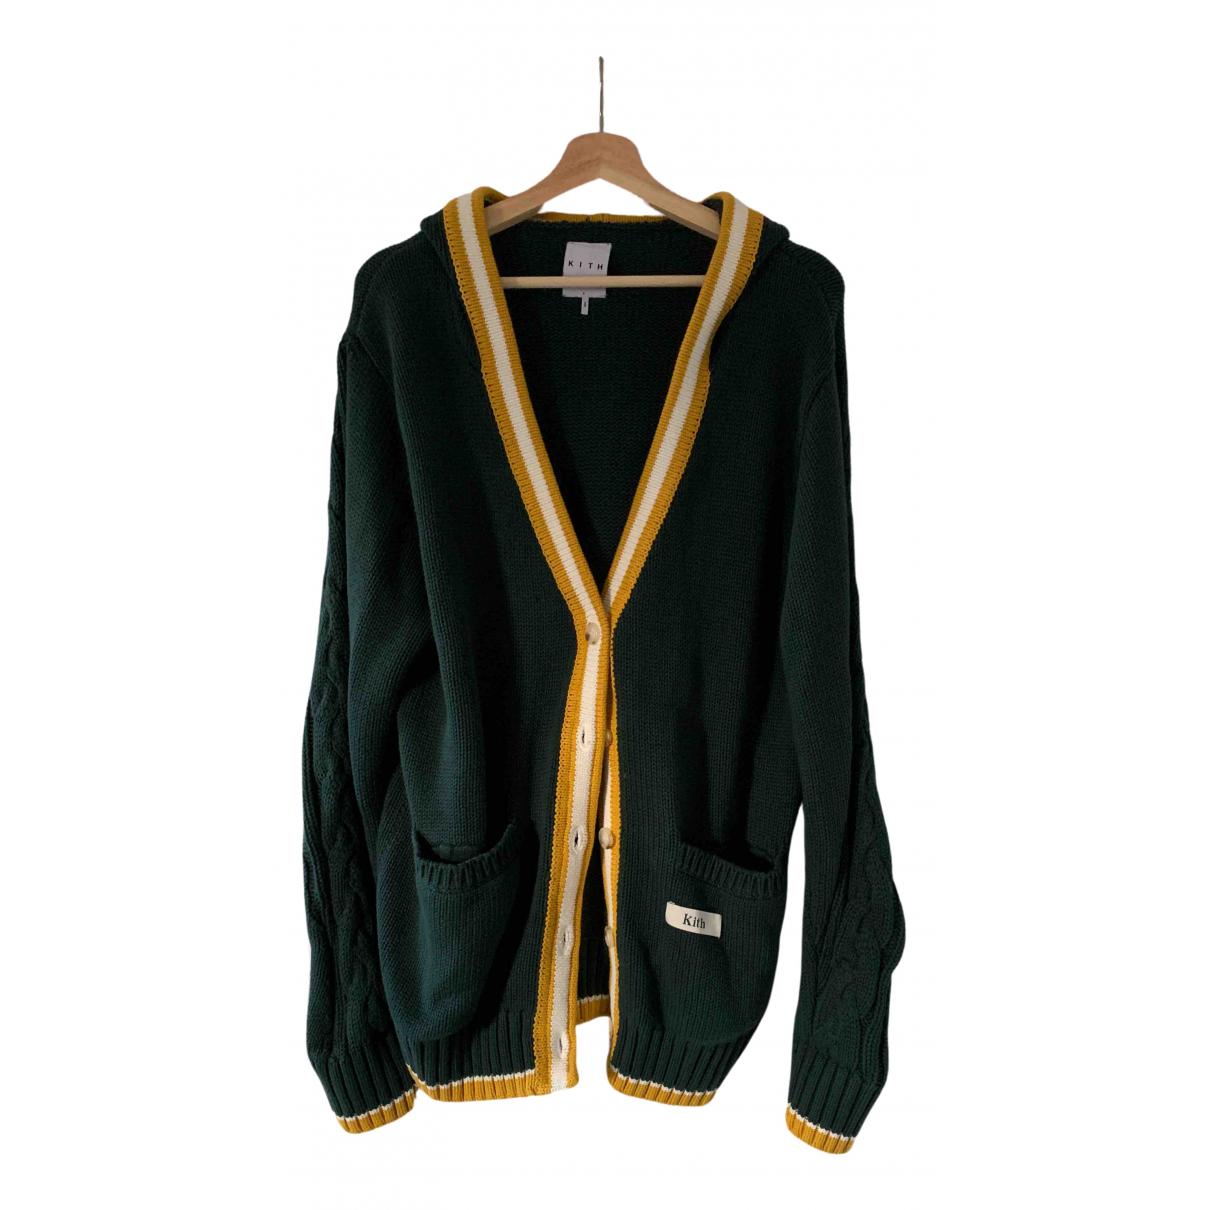 Kith \N Green Cotton Knitwear for Women S International